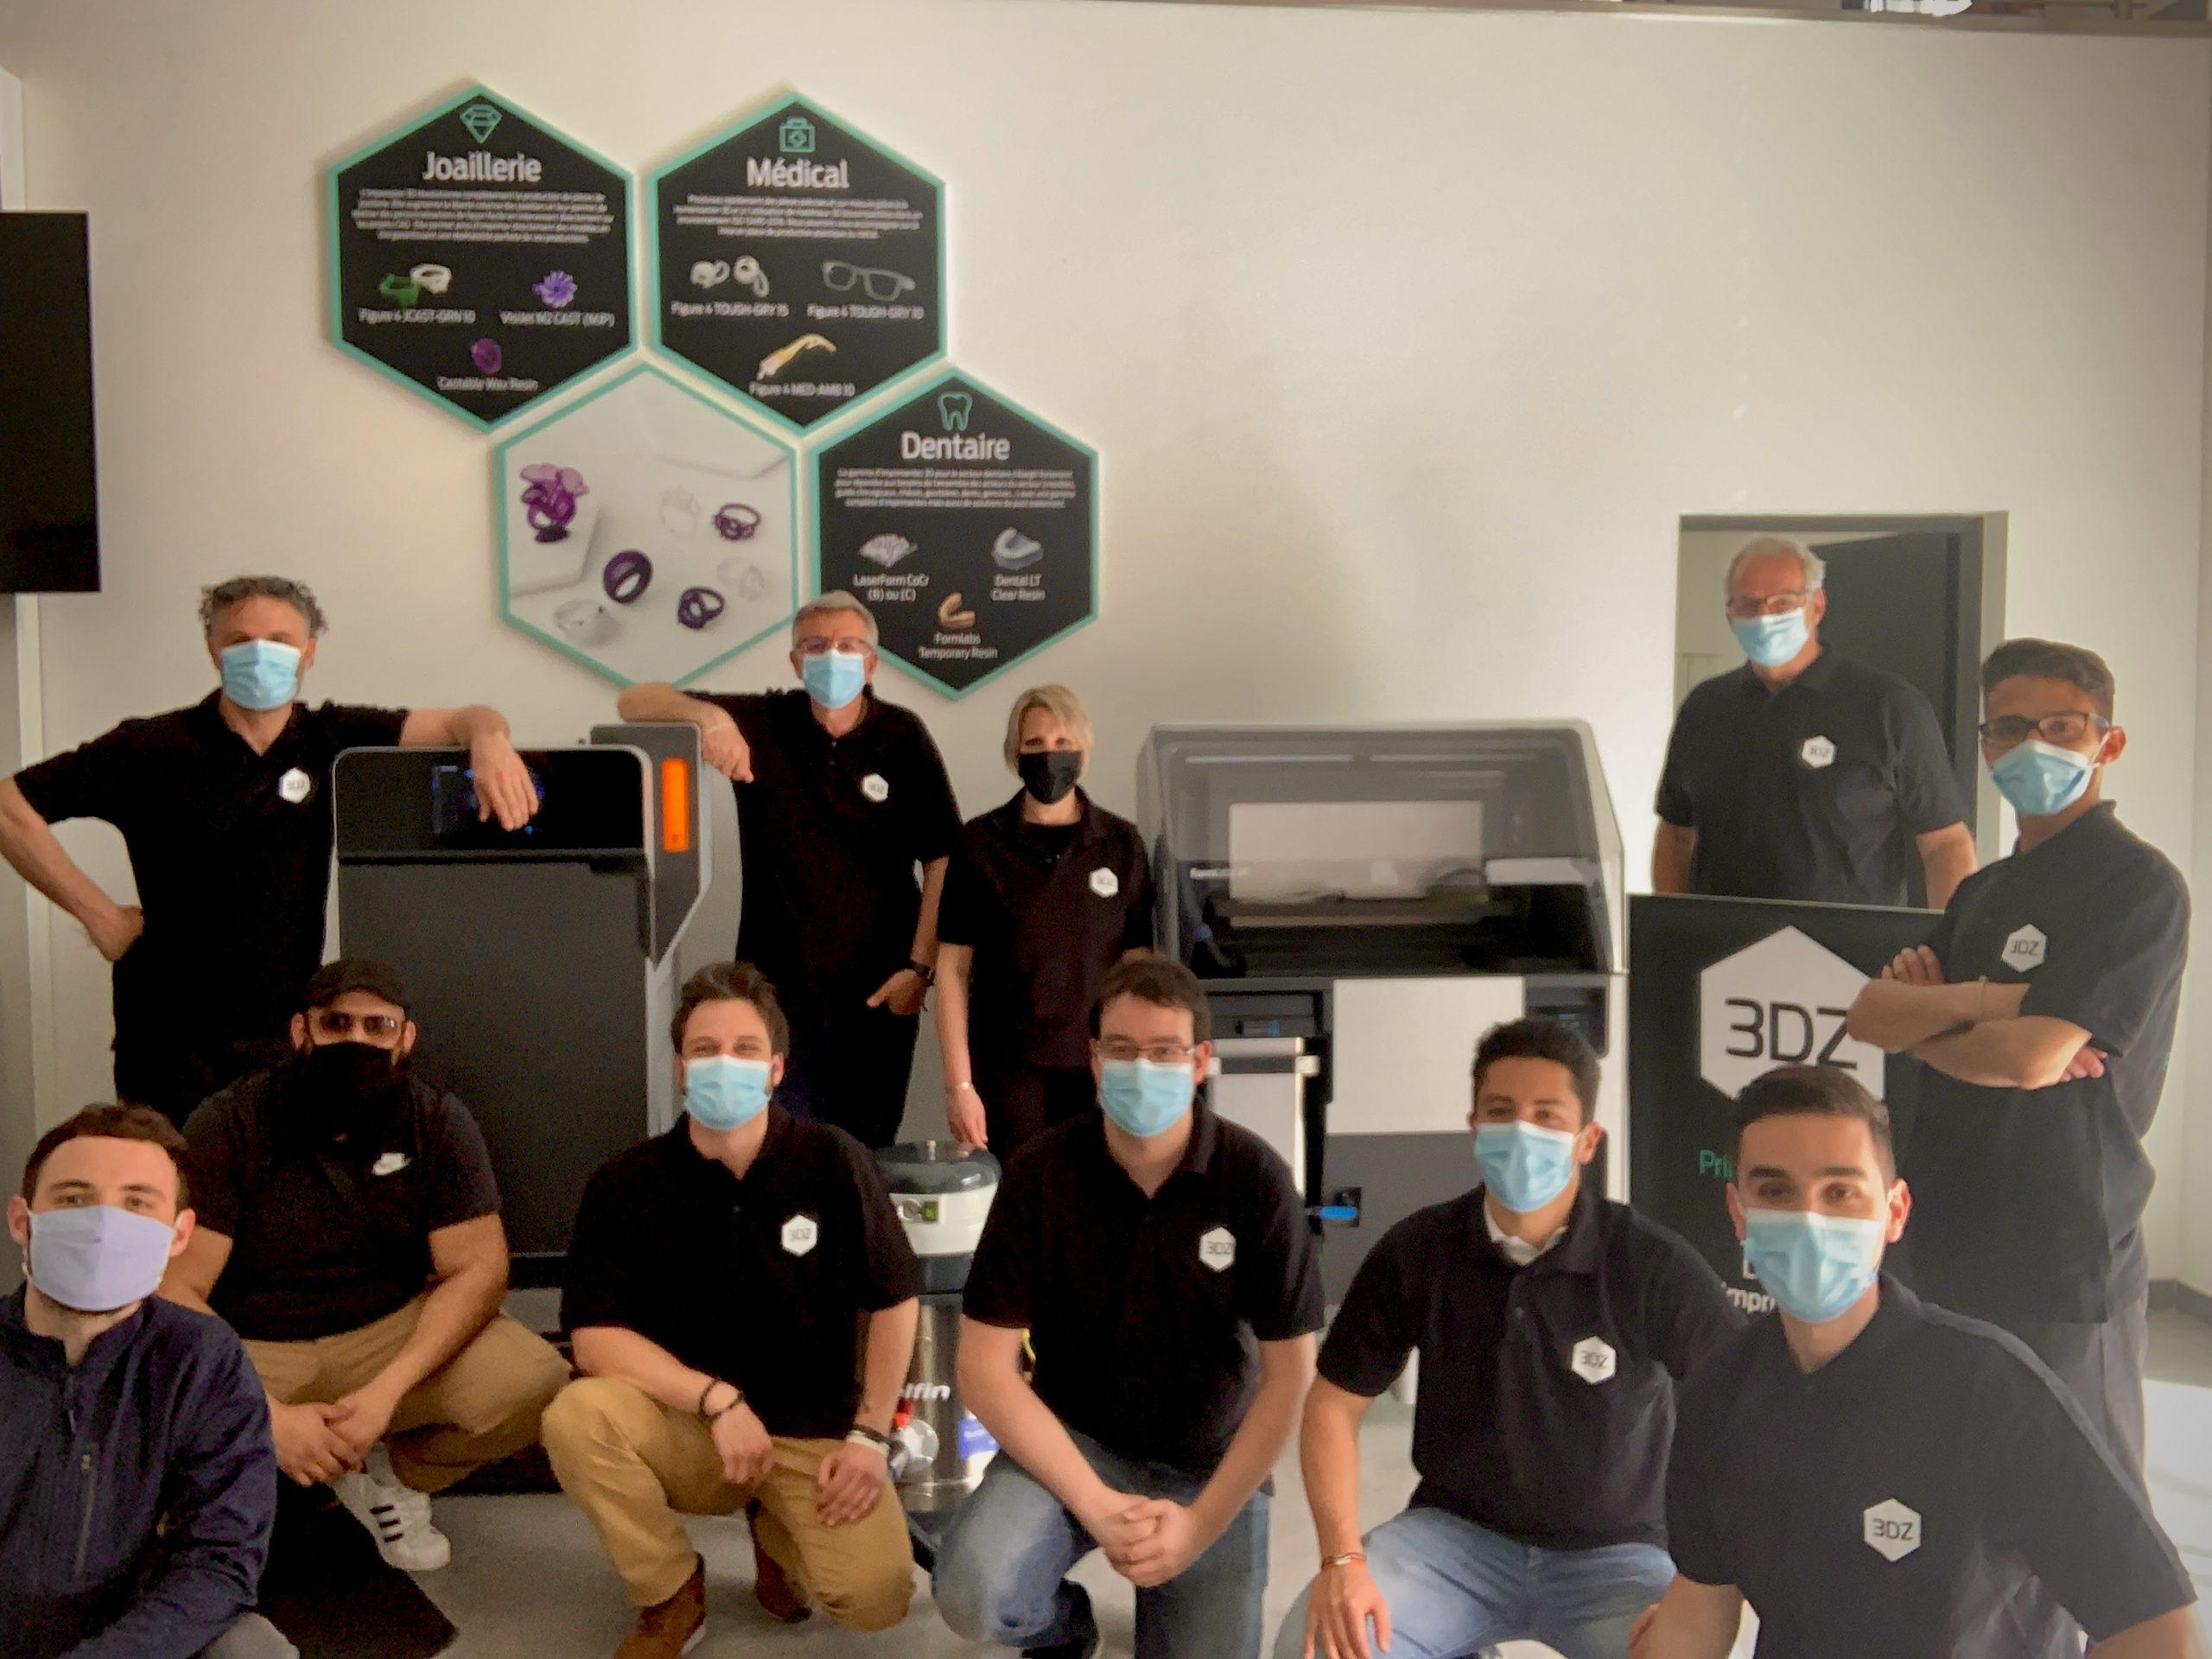 The 3DZ France team. Photo via PostProcess Technologies.